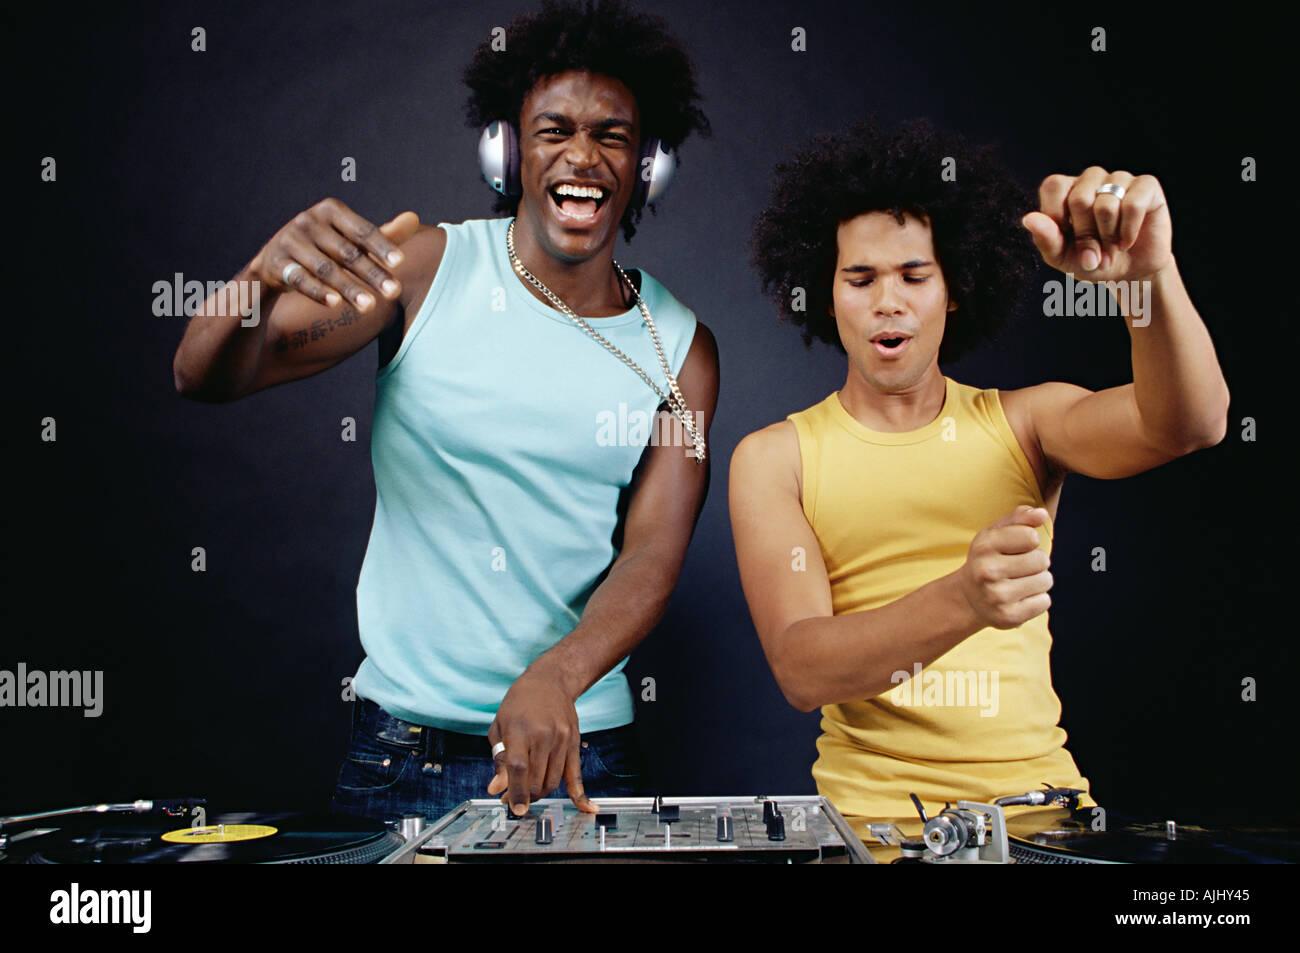 Two young men DJing - Stock Image